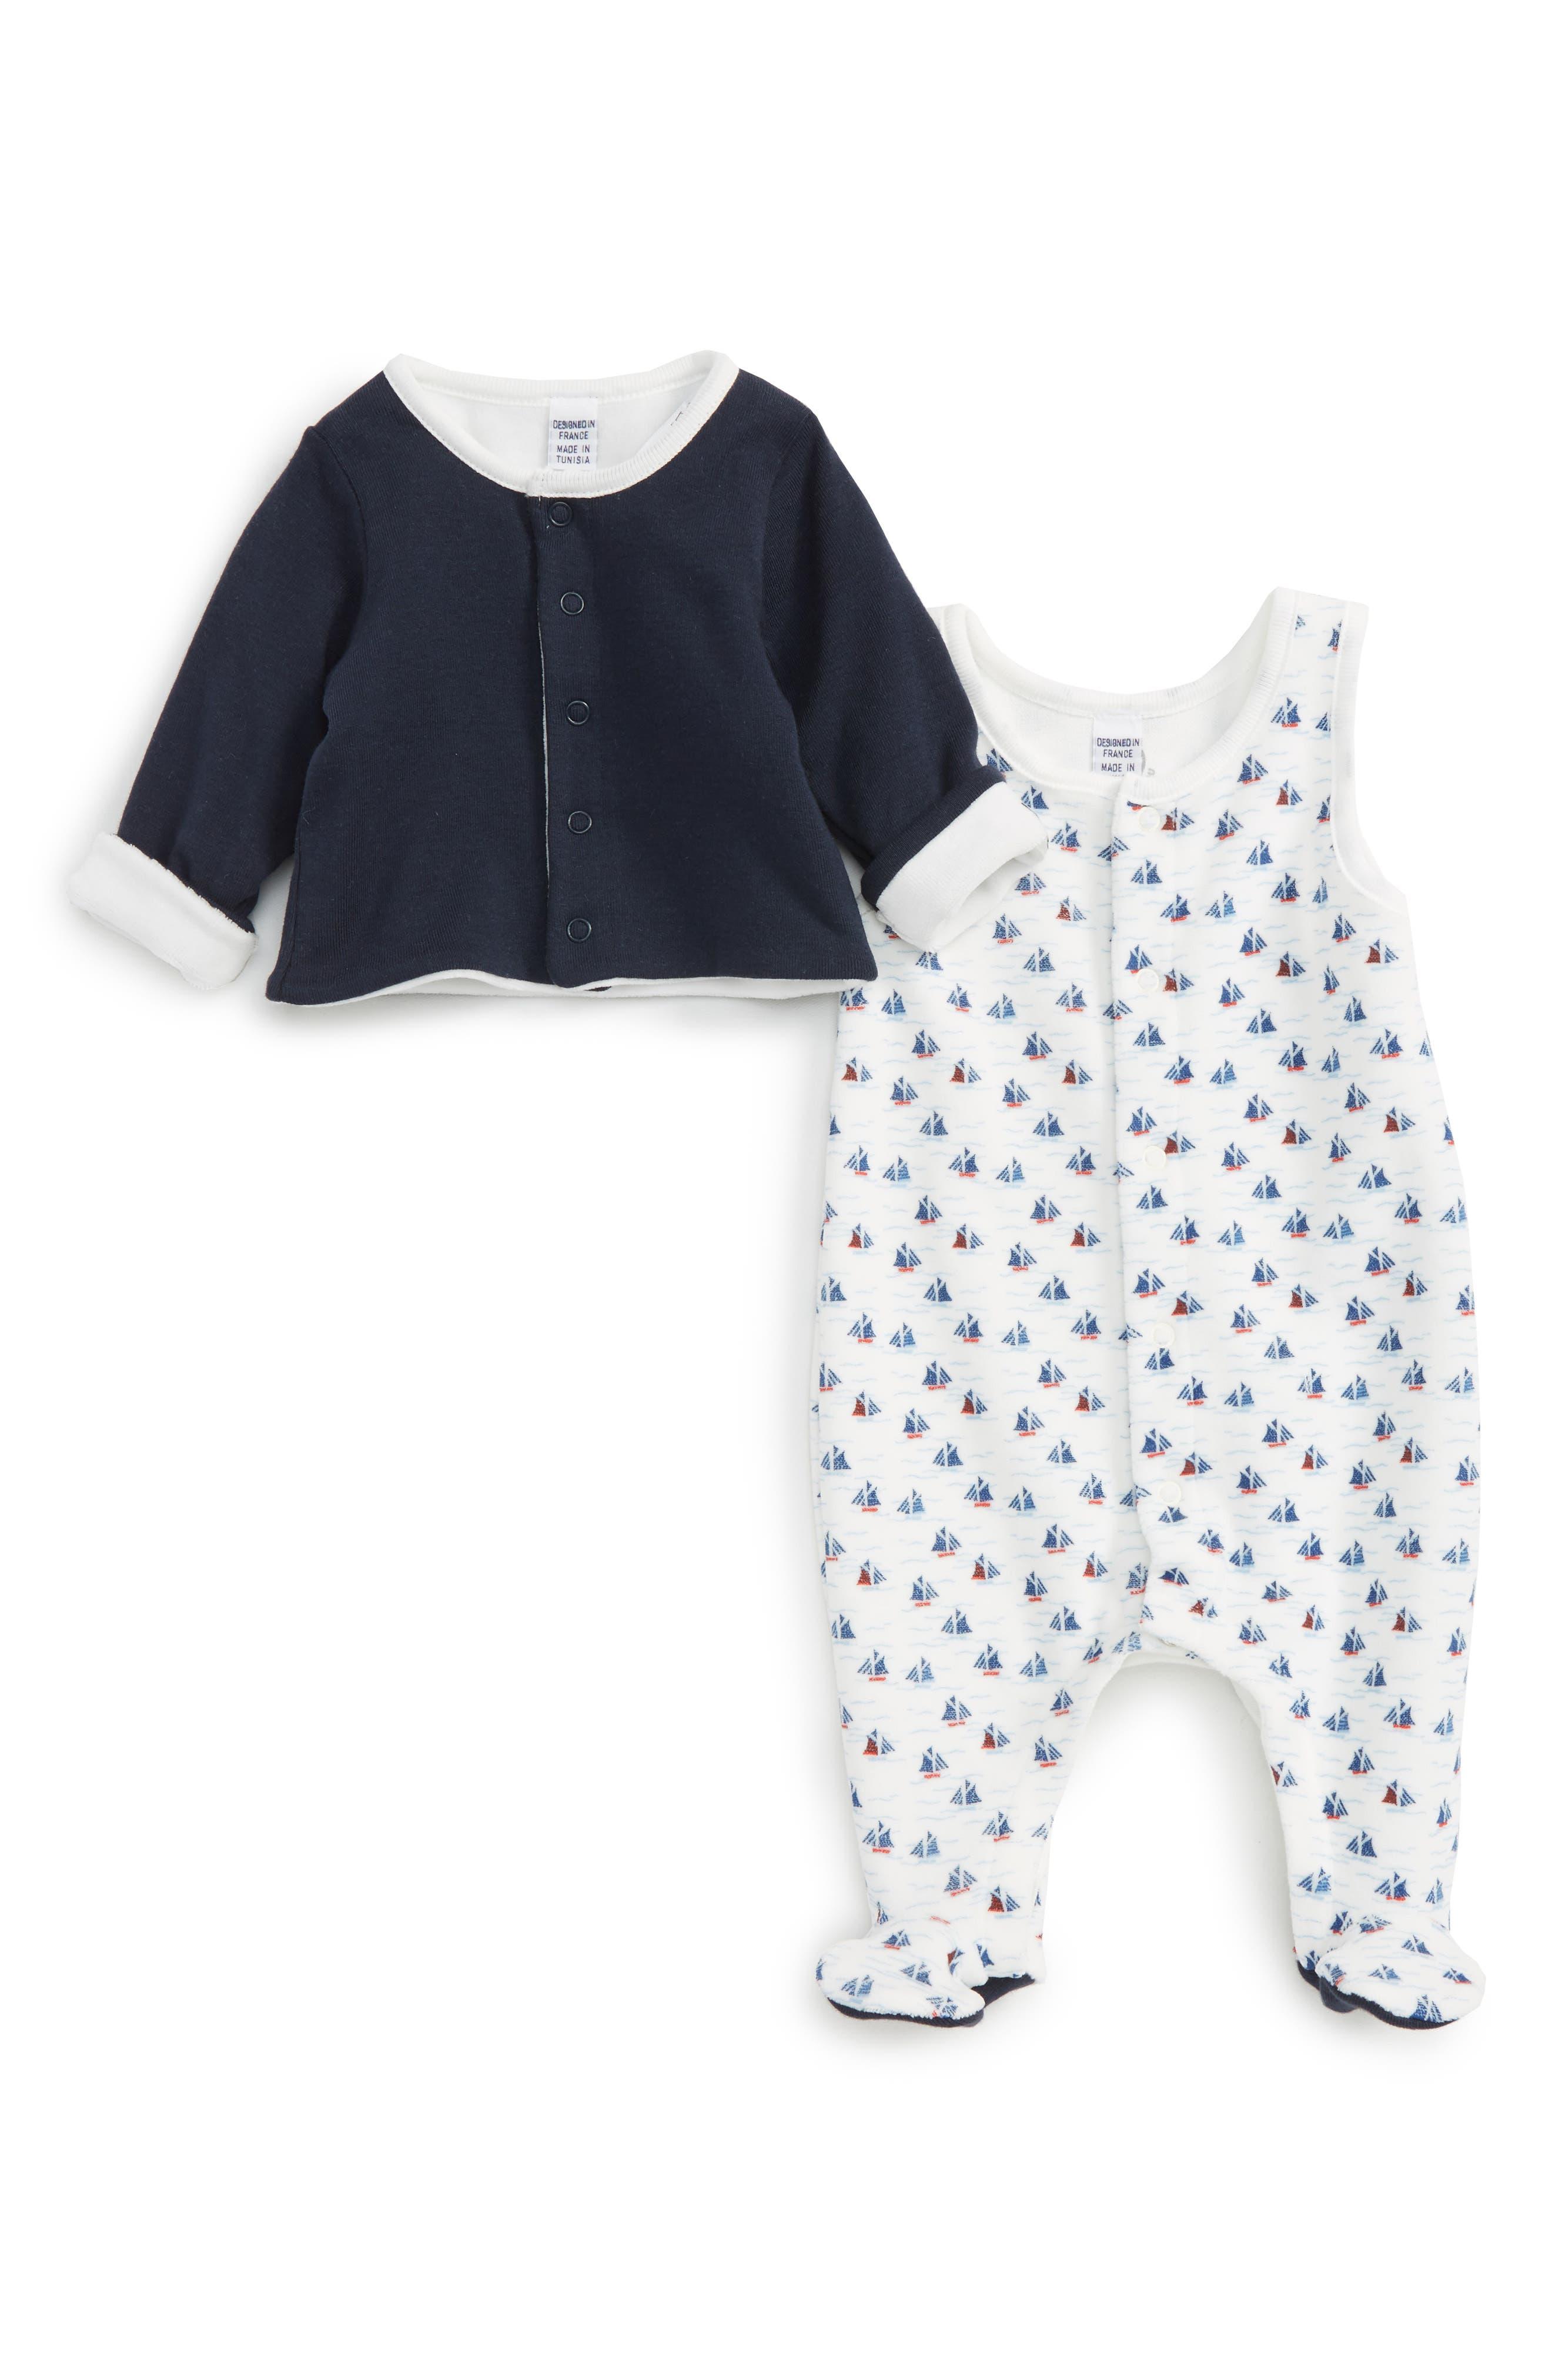 Main Image - Petit Bateau Footie & Jacket Set (Baby Boys)